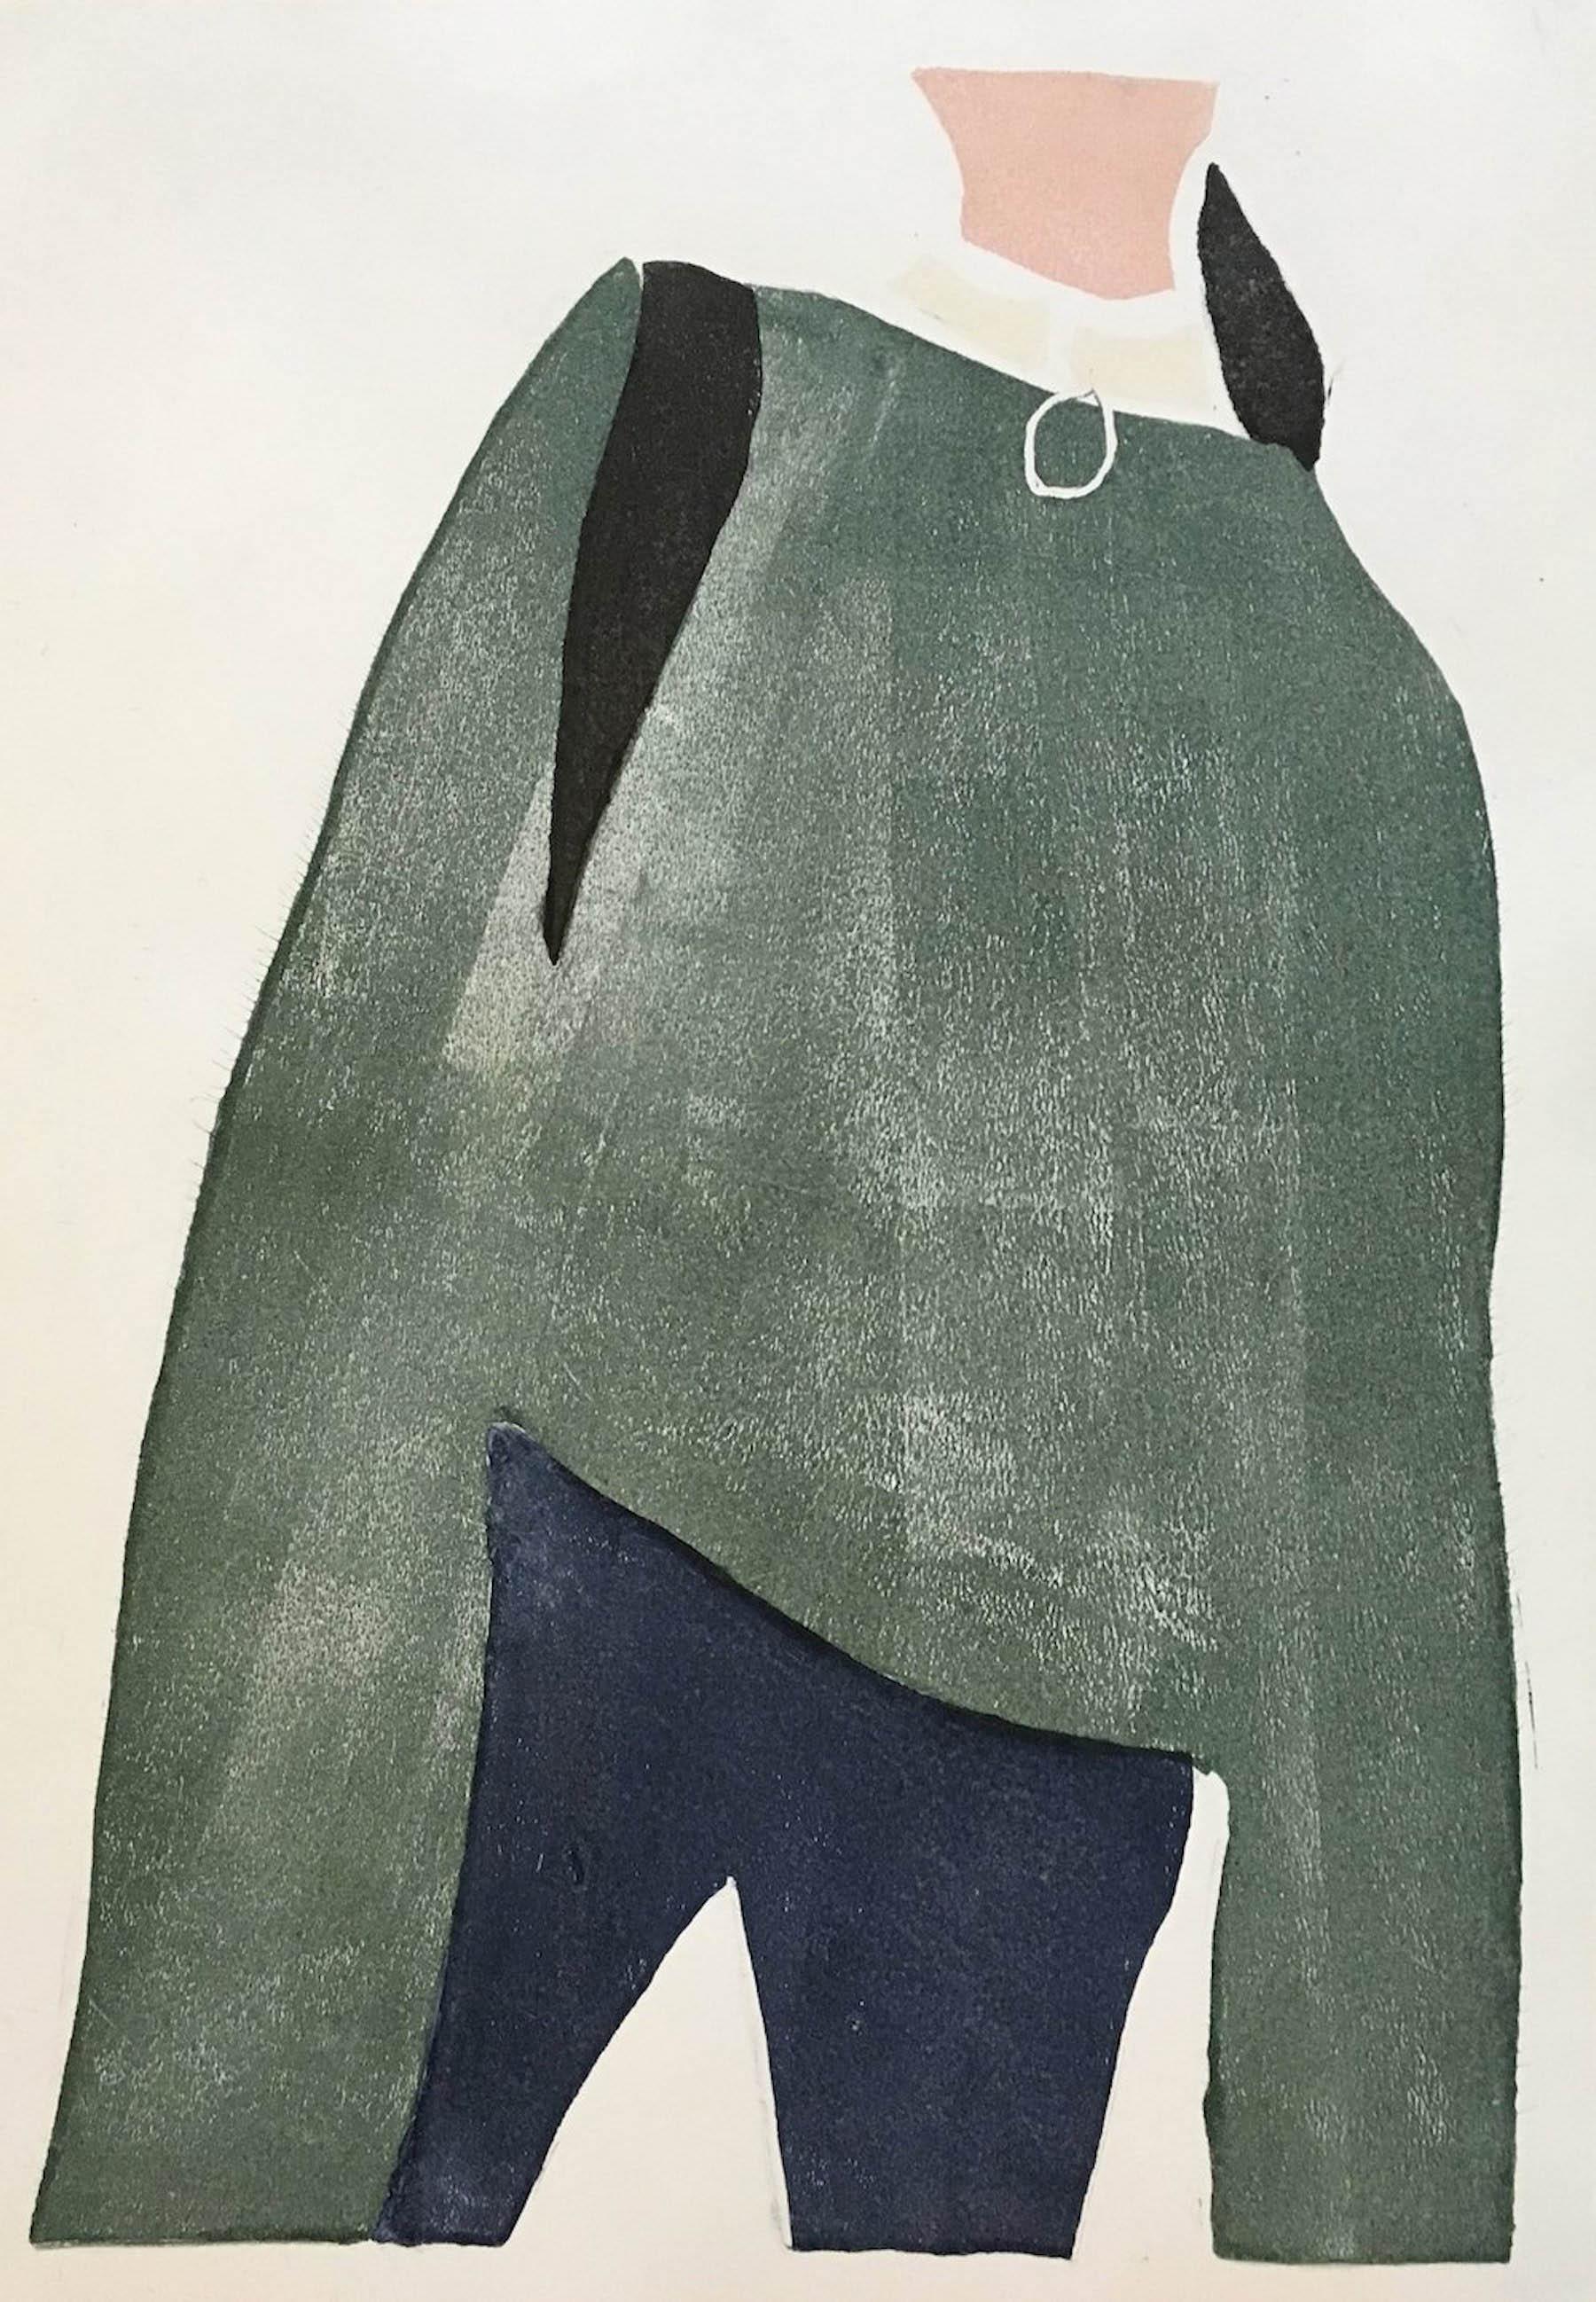 iGNANT-Art-Renee-Gouin-07